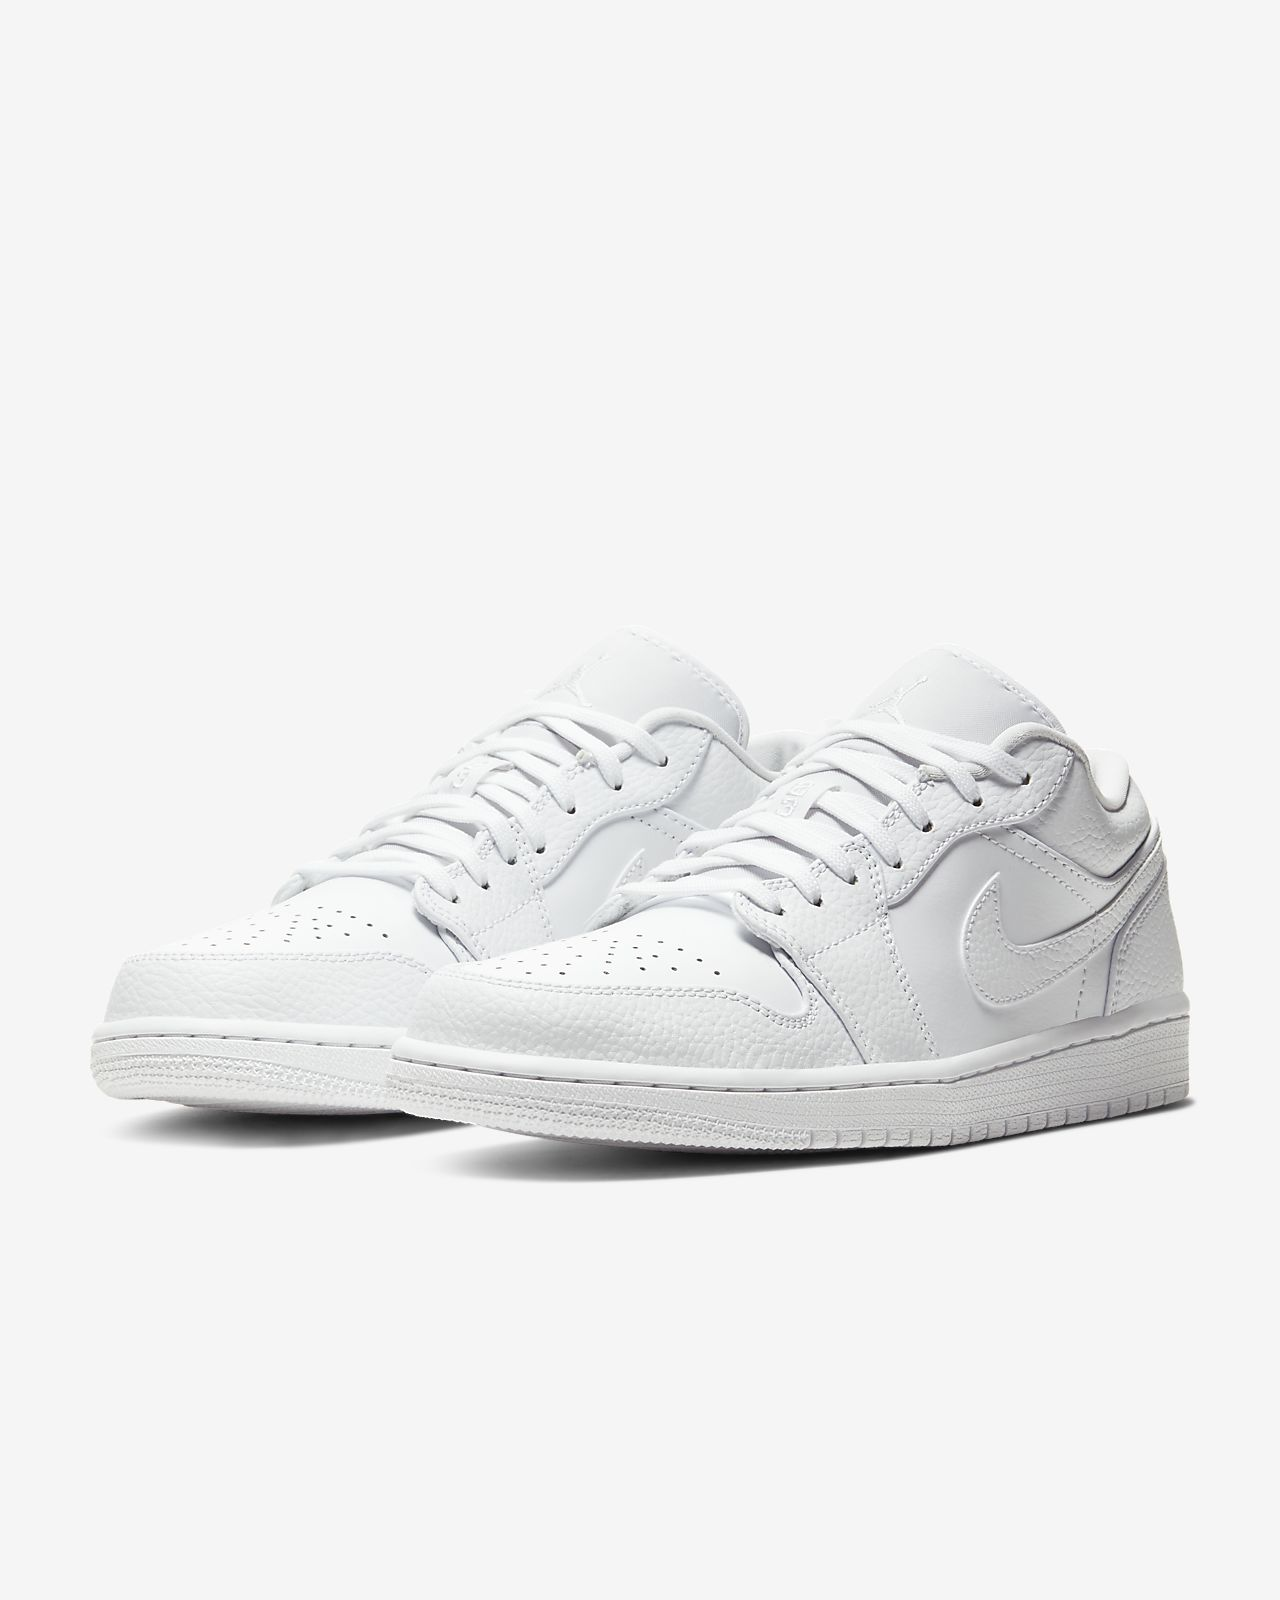 us 4y shoe size